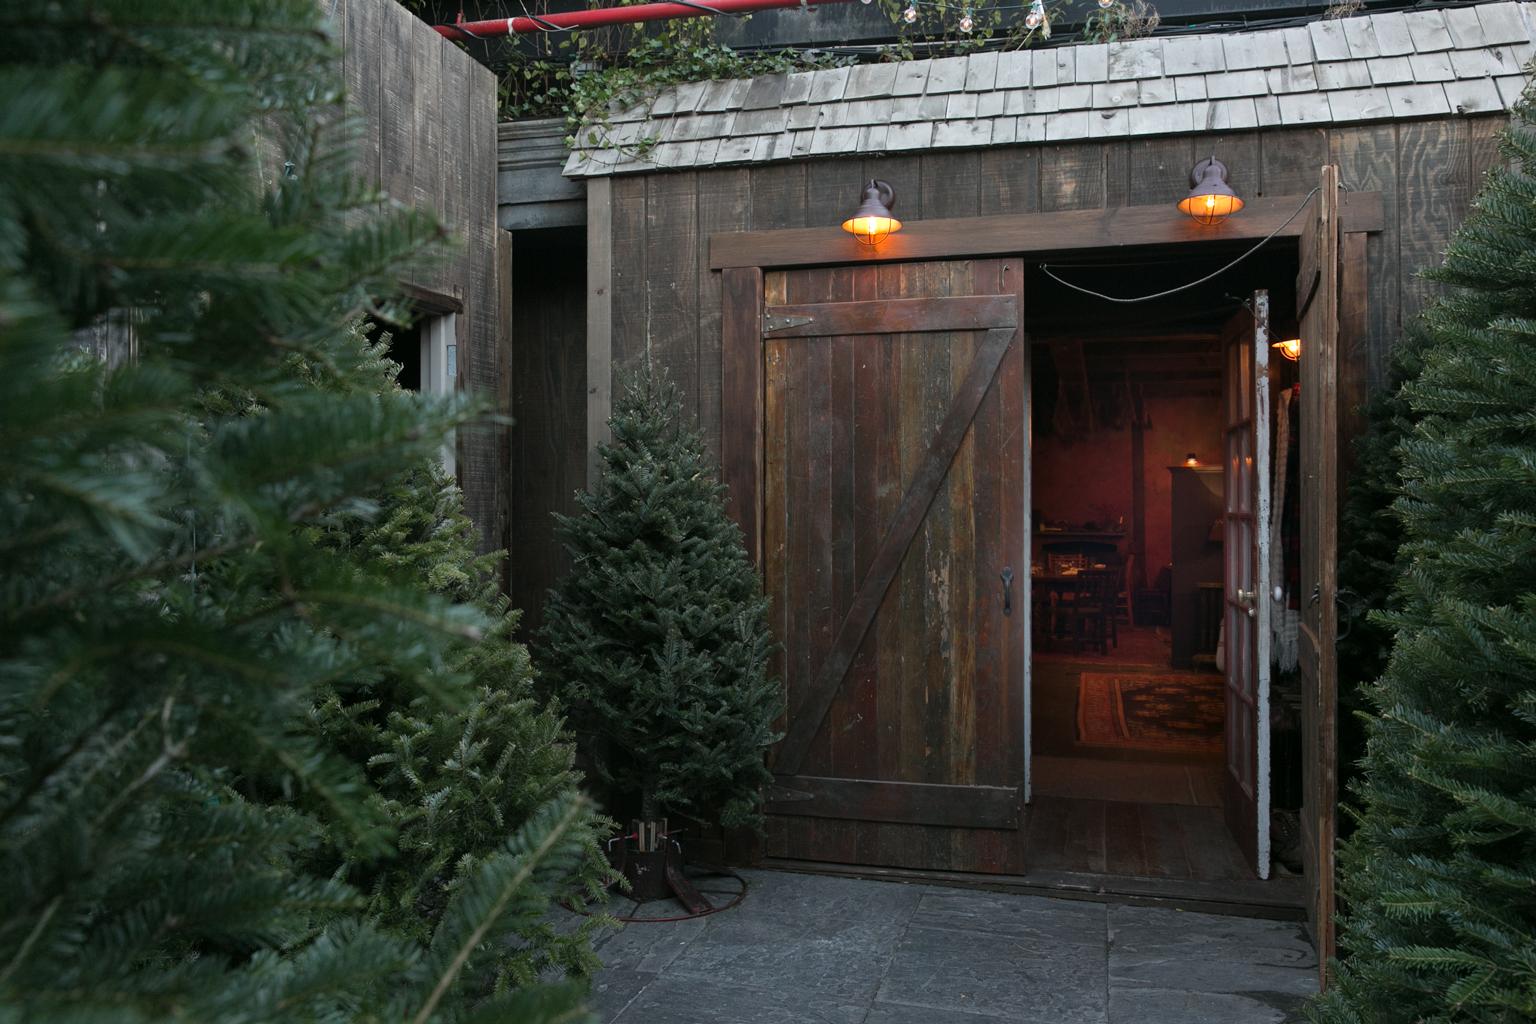 The-Lodge-Entrance-1_Conor-Harrigan-1.jpg